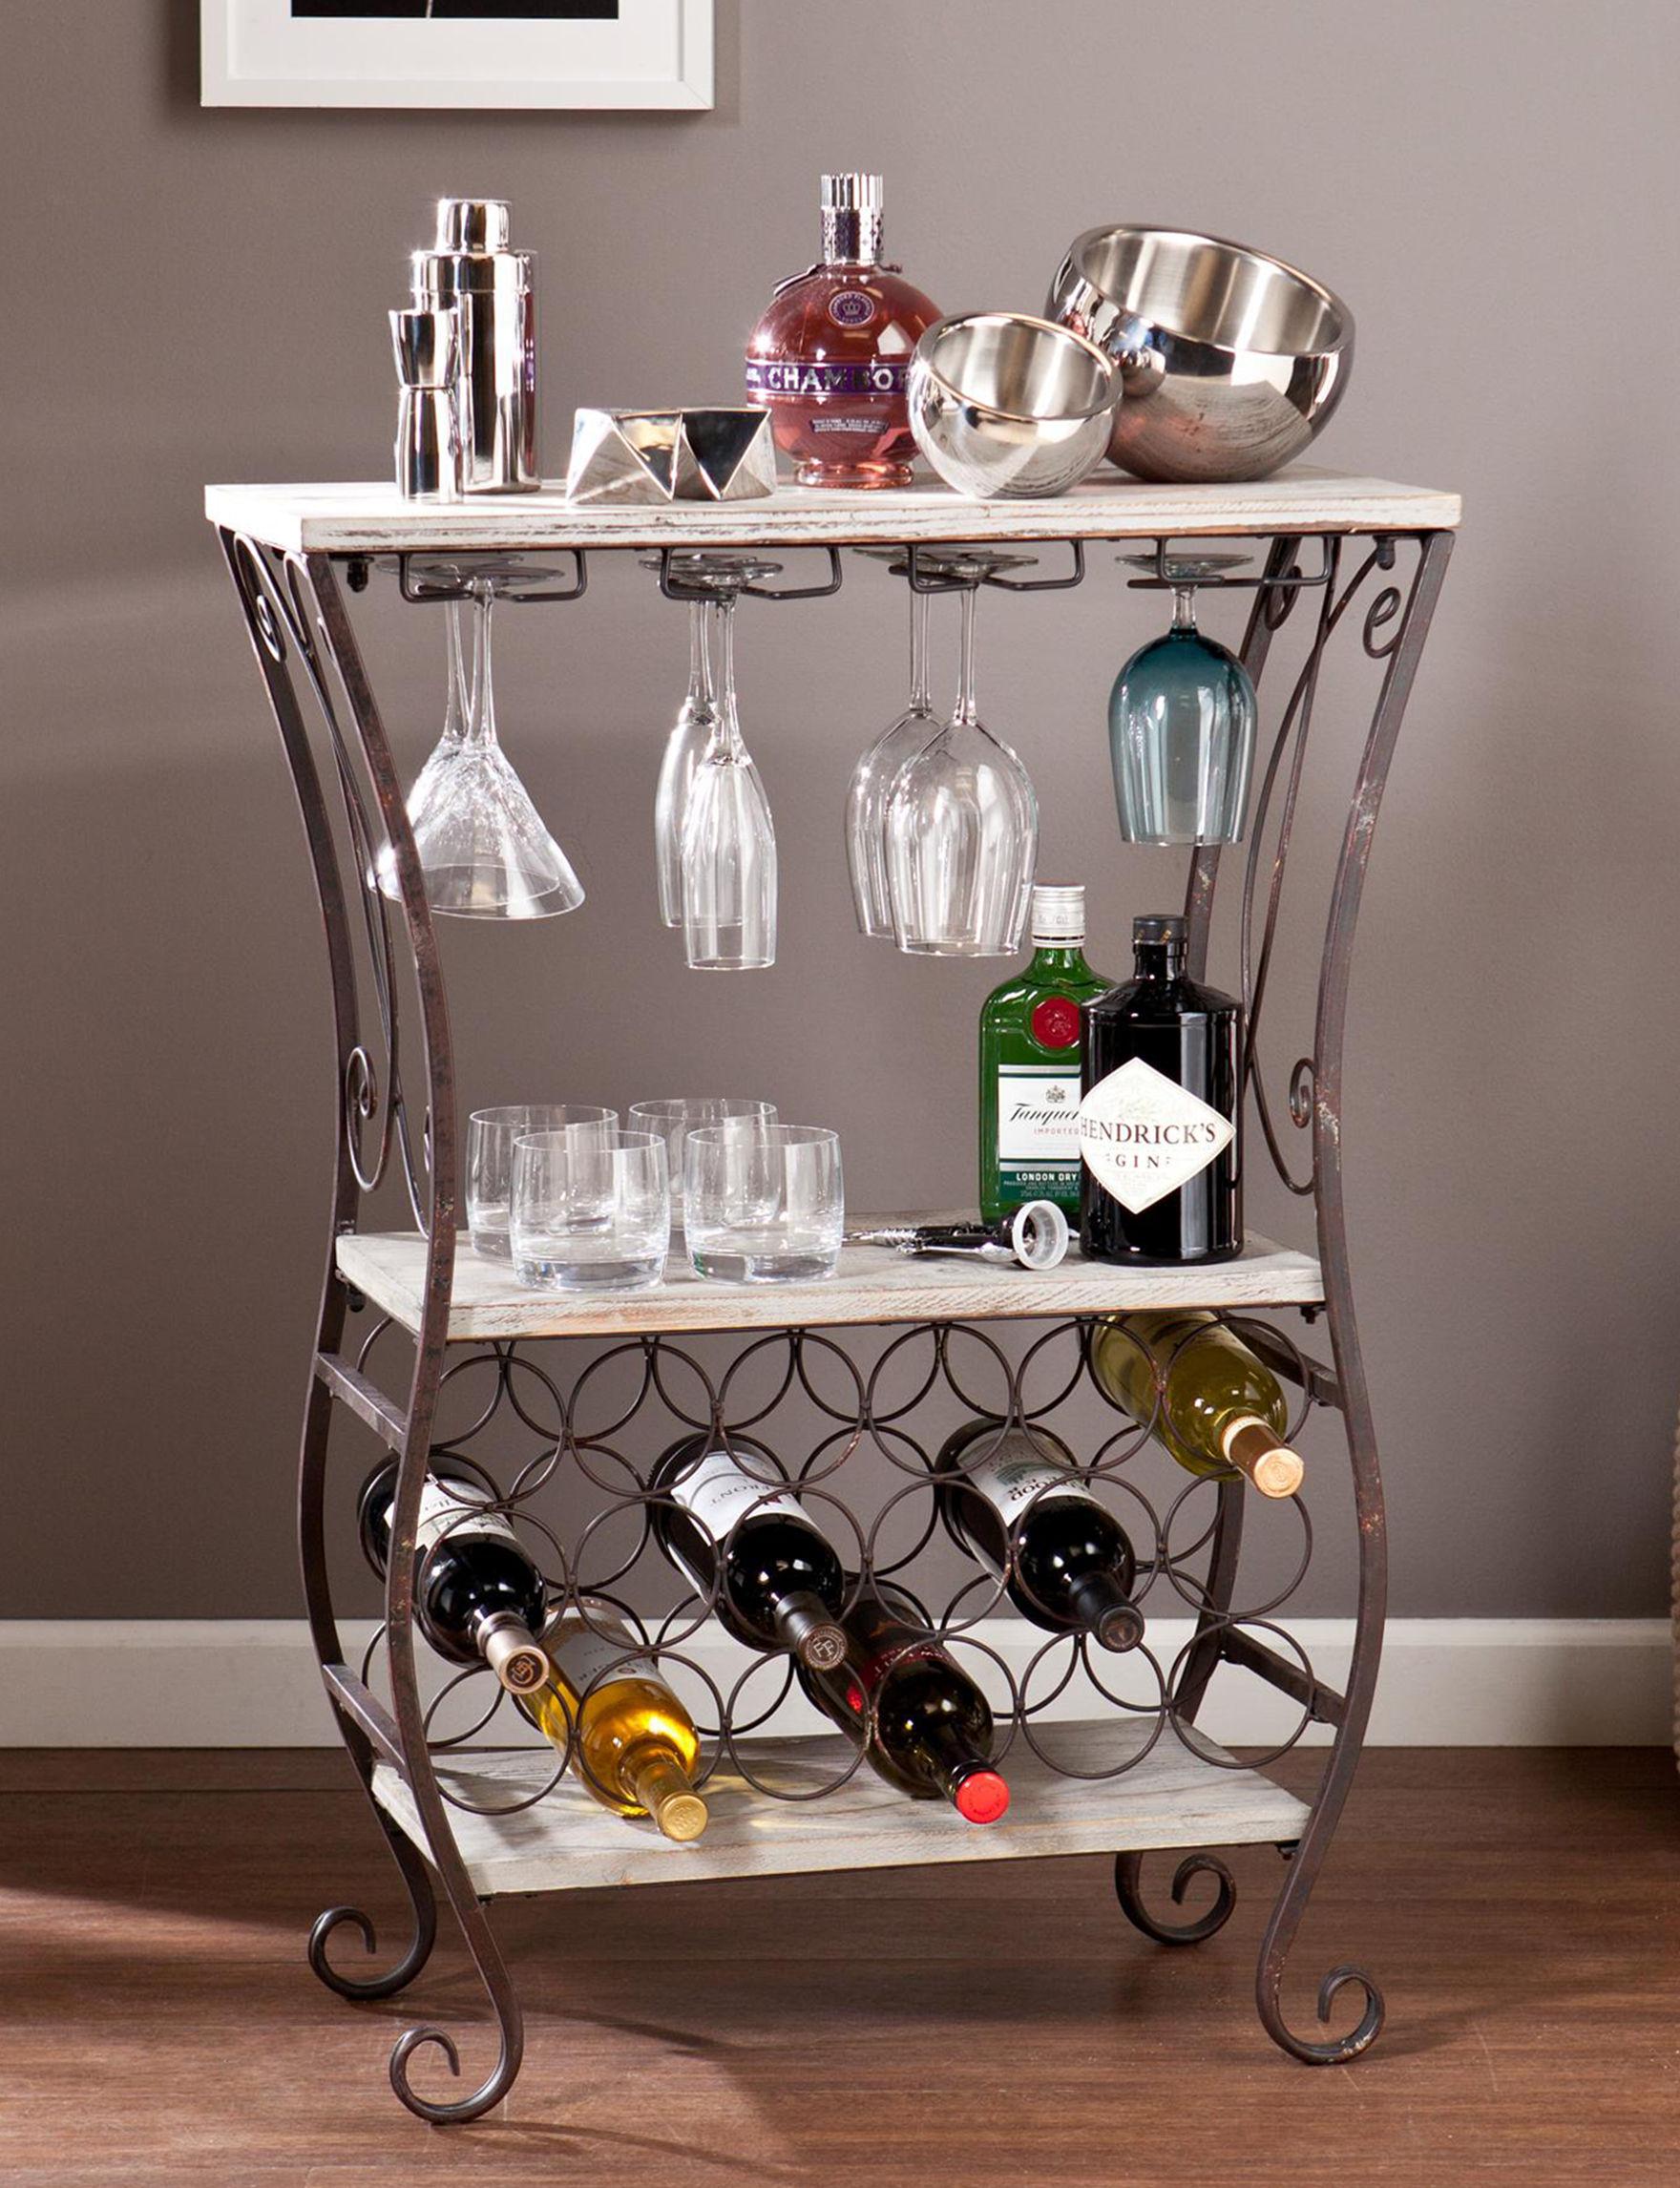 Southern Enterprises Grey Bar & Wine Storage Kitchen Islands & Carts Wine Racks Home Accents Living Room Furniture